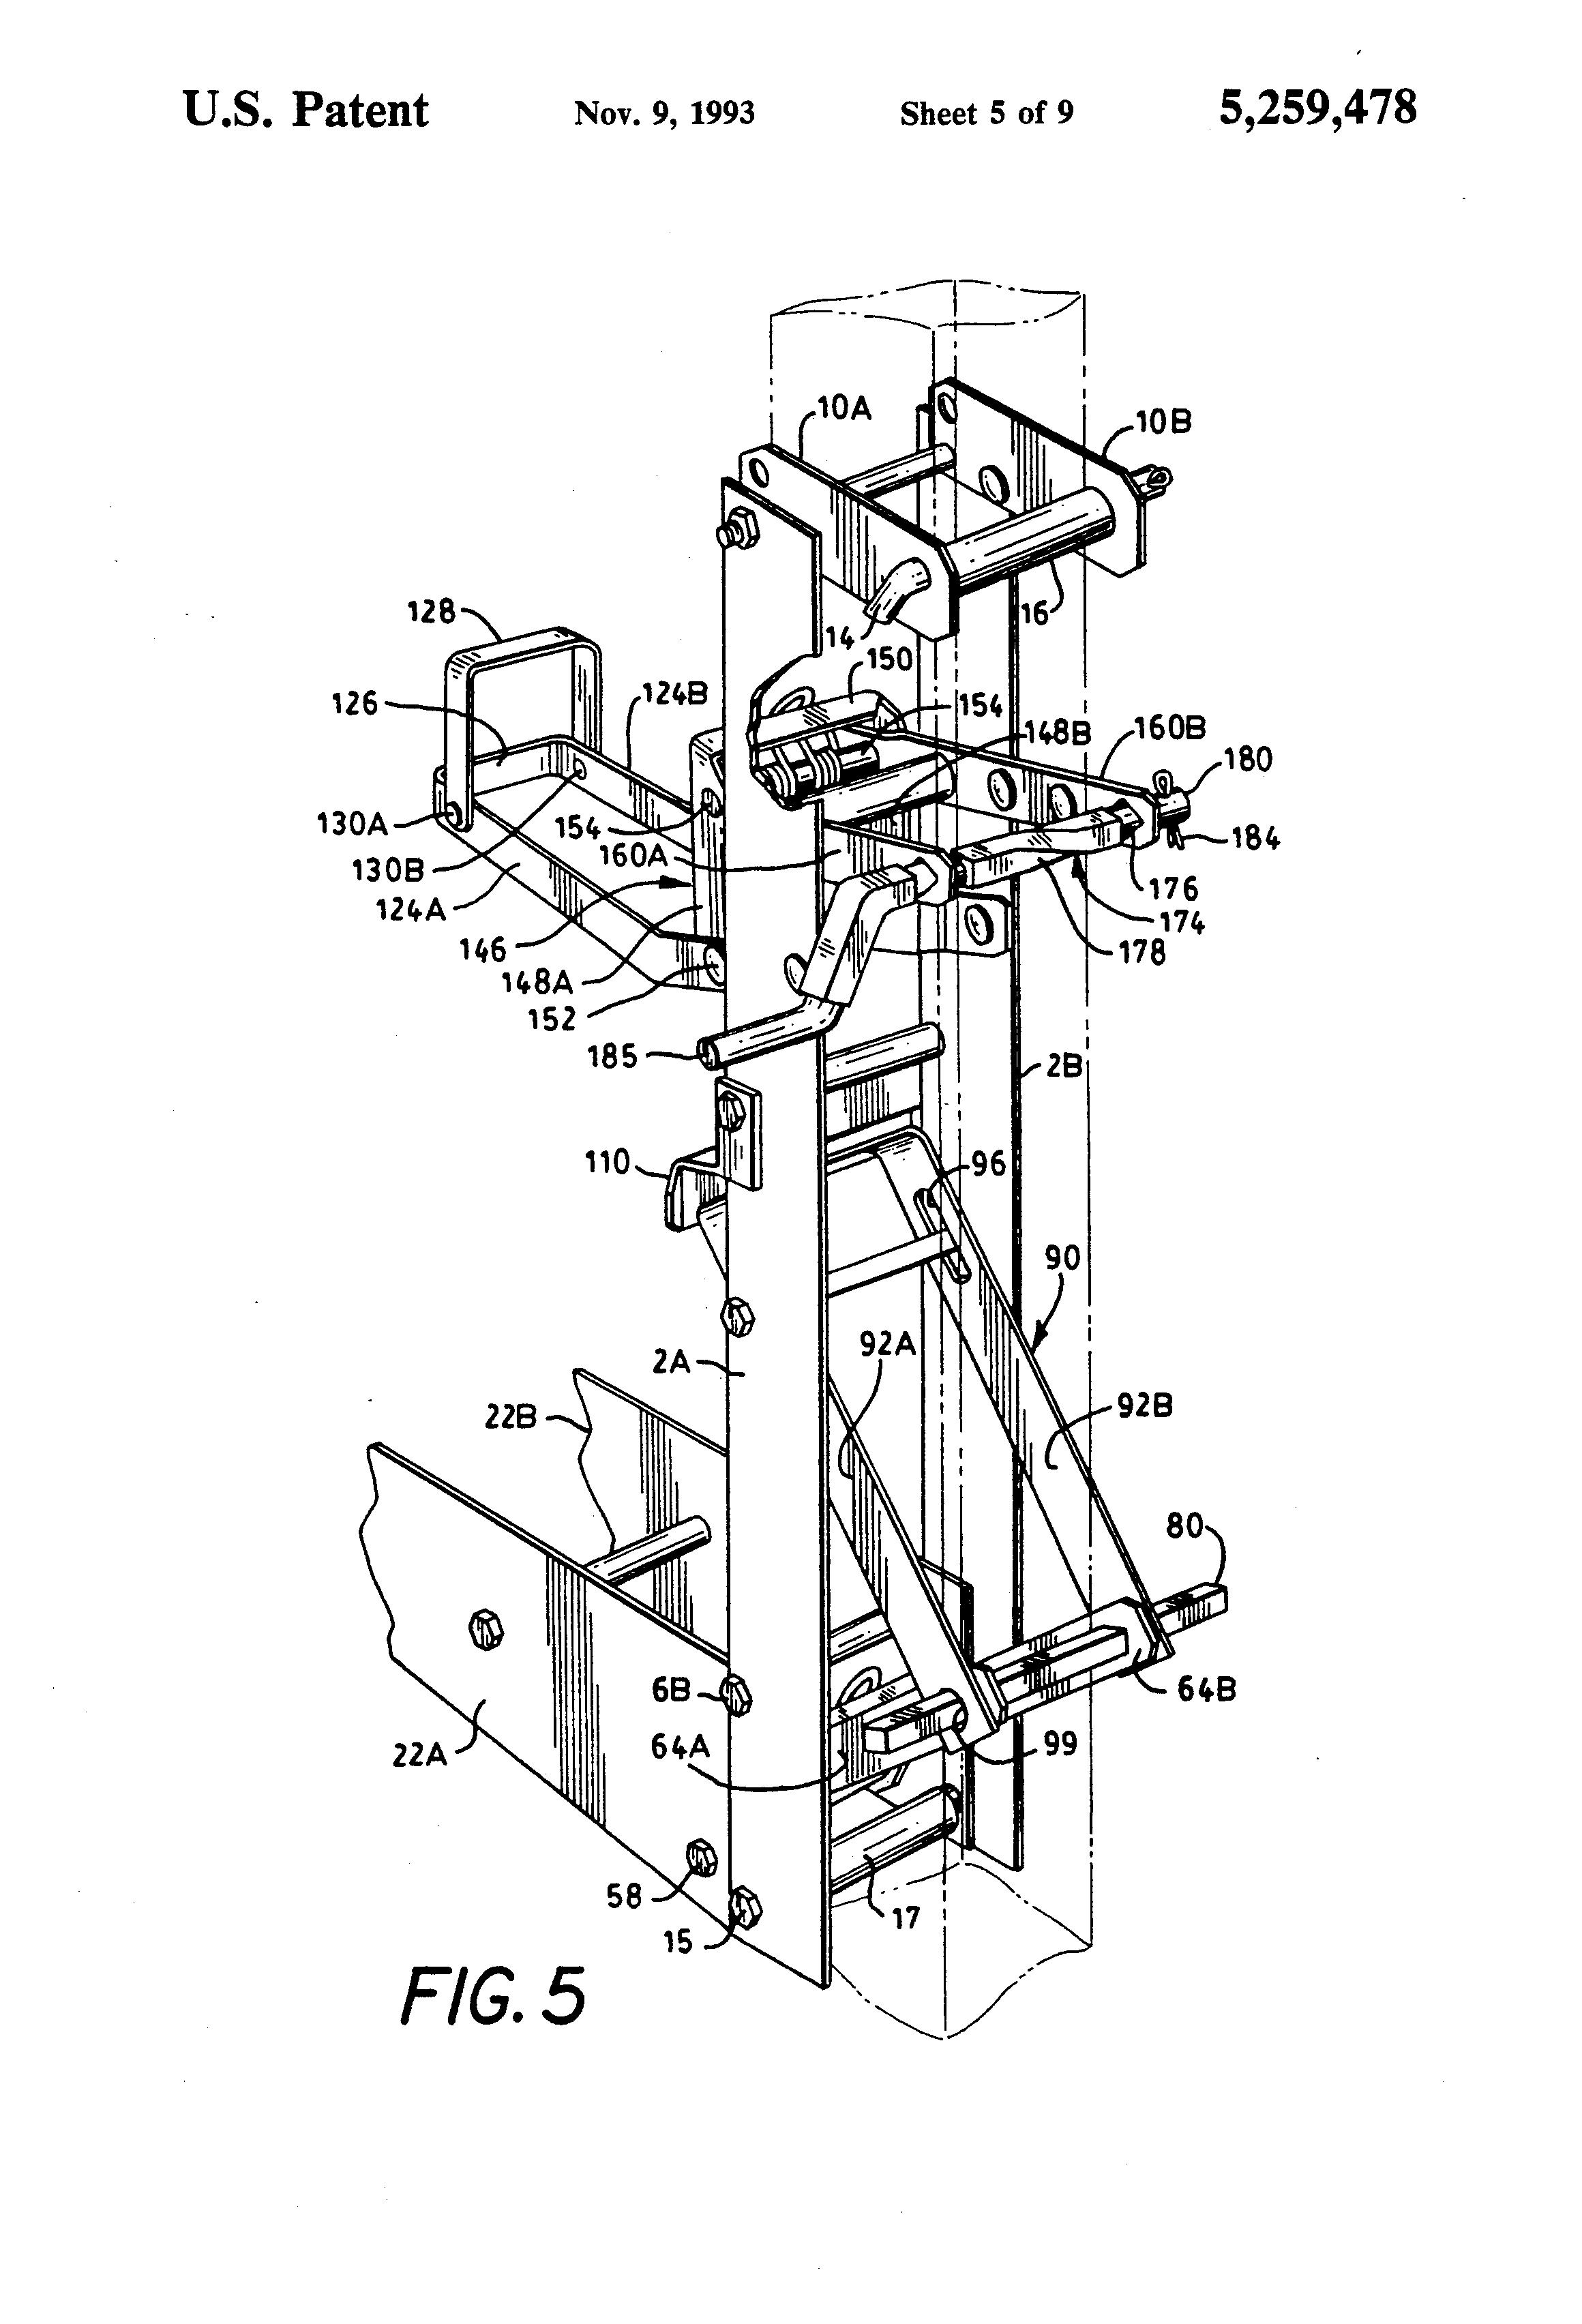 Pump Jack Wiring Diagrams Guitar Diagram Image Result For Pumpjack Scaffolding System Design Rh Pinterest Com Input